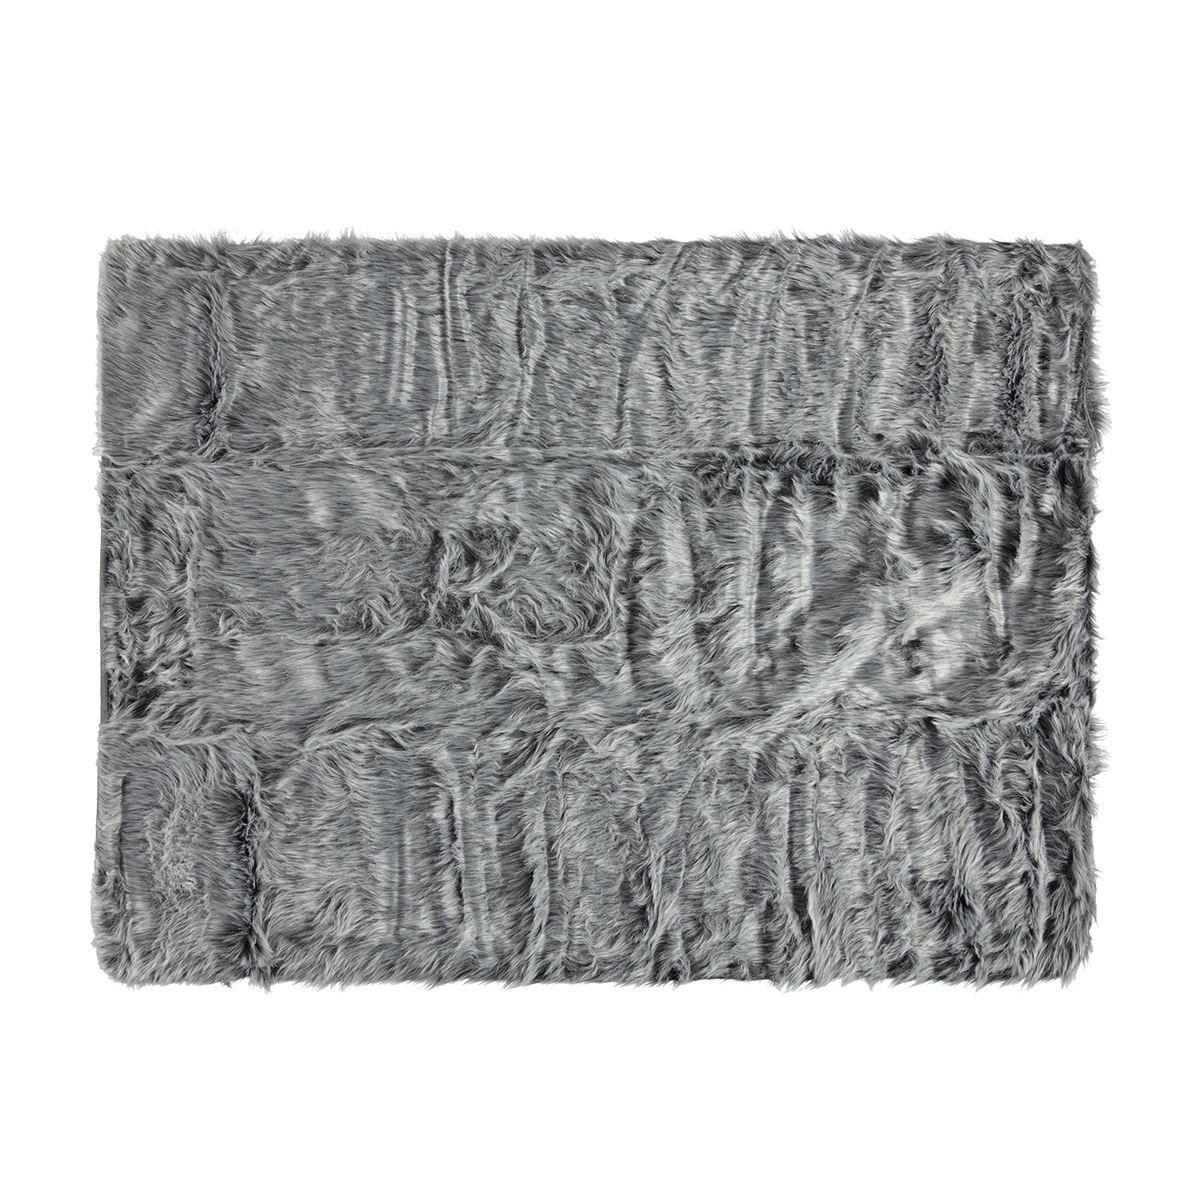 Badezimmer dekor kmart artificial fur pet blanket  wishlist  furry friends  pinterest